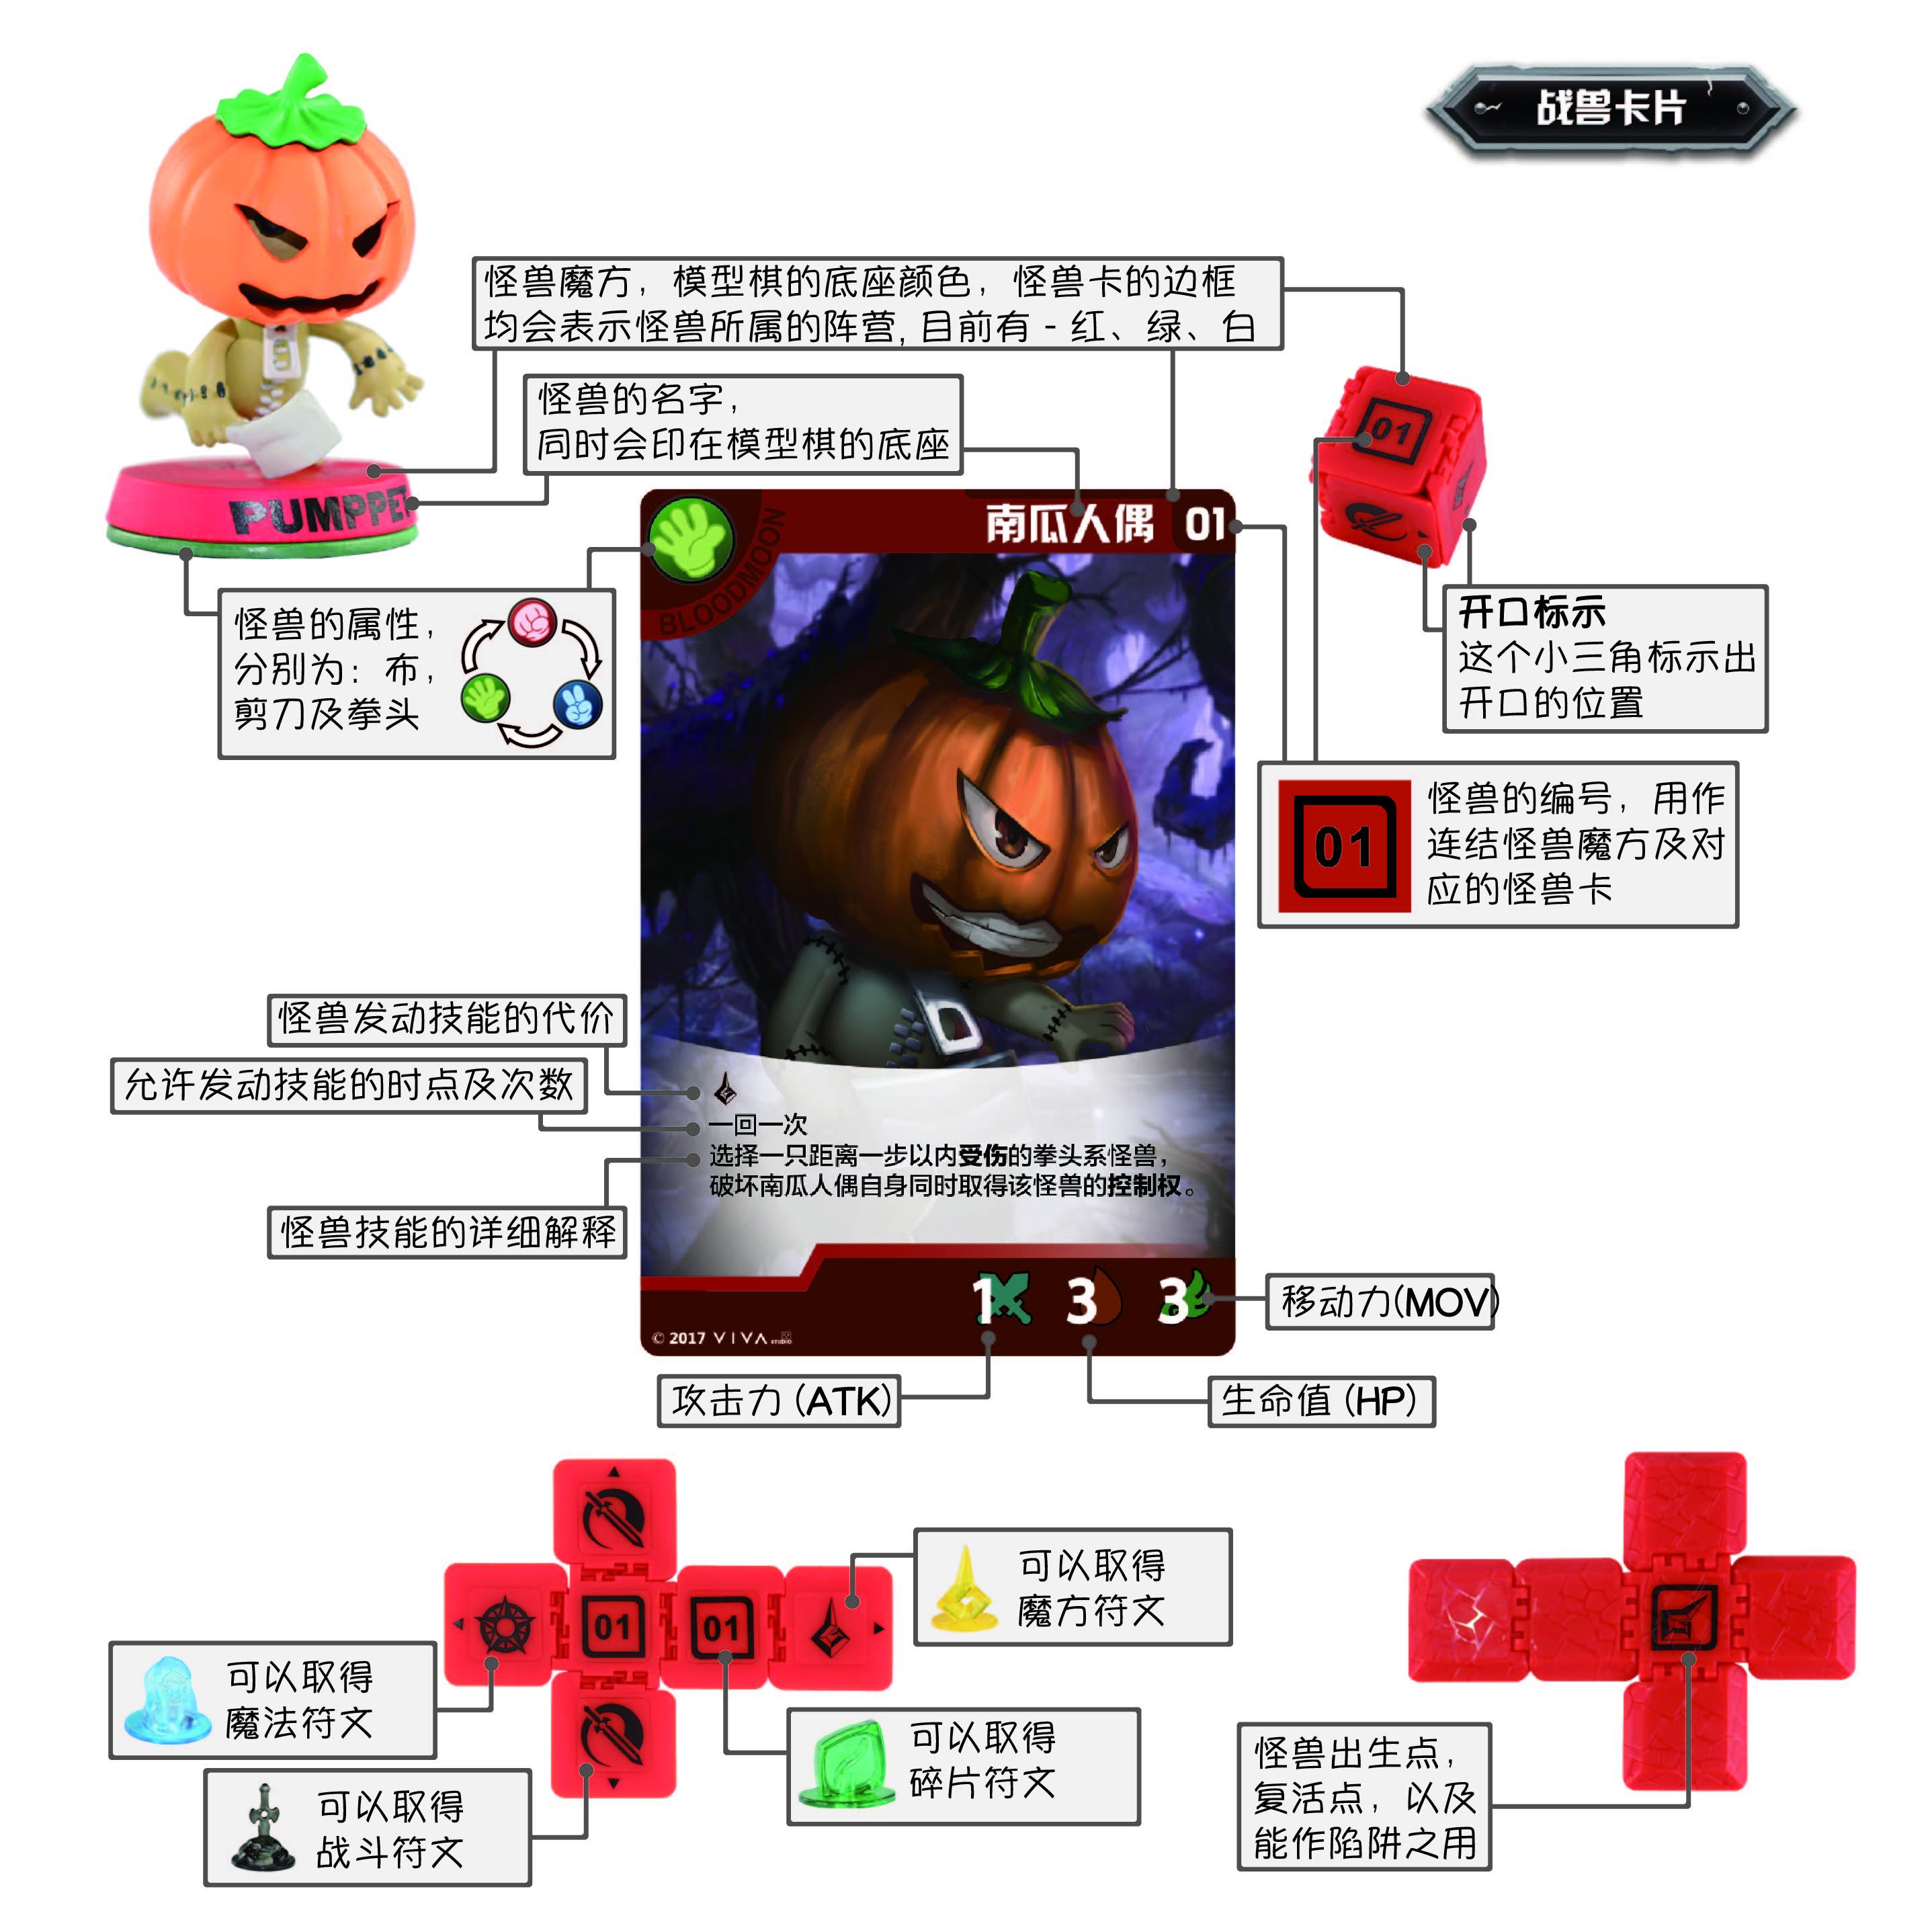 Page_1_5_R01-01.jpg